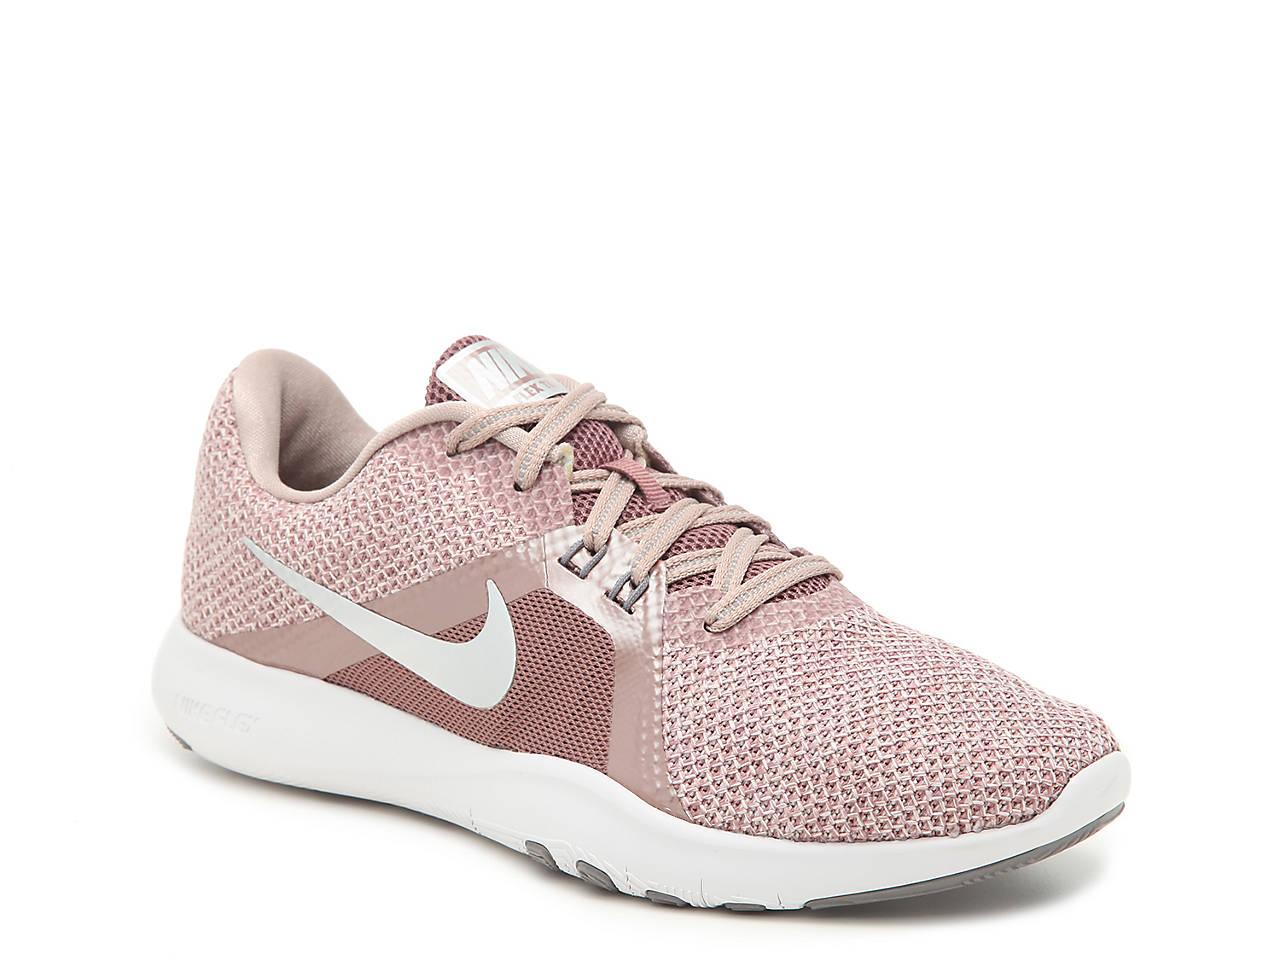 81b3d04a744 Nike Flex TR 8 Lightweight Training Shoe - Women s Women s Shoes